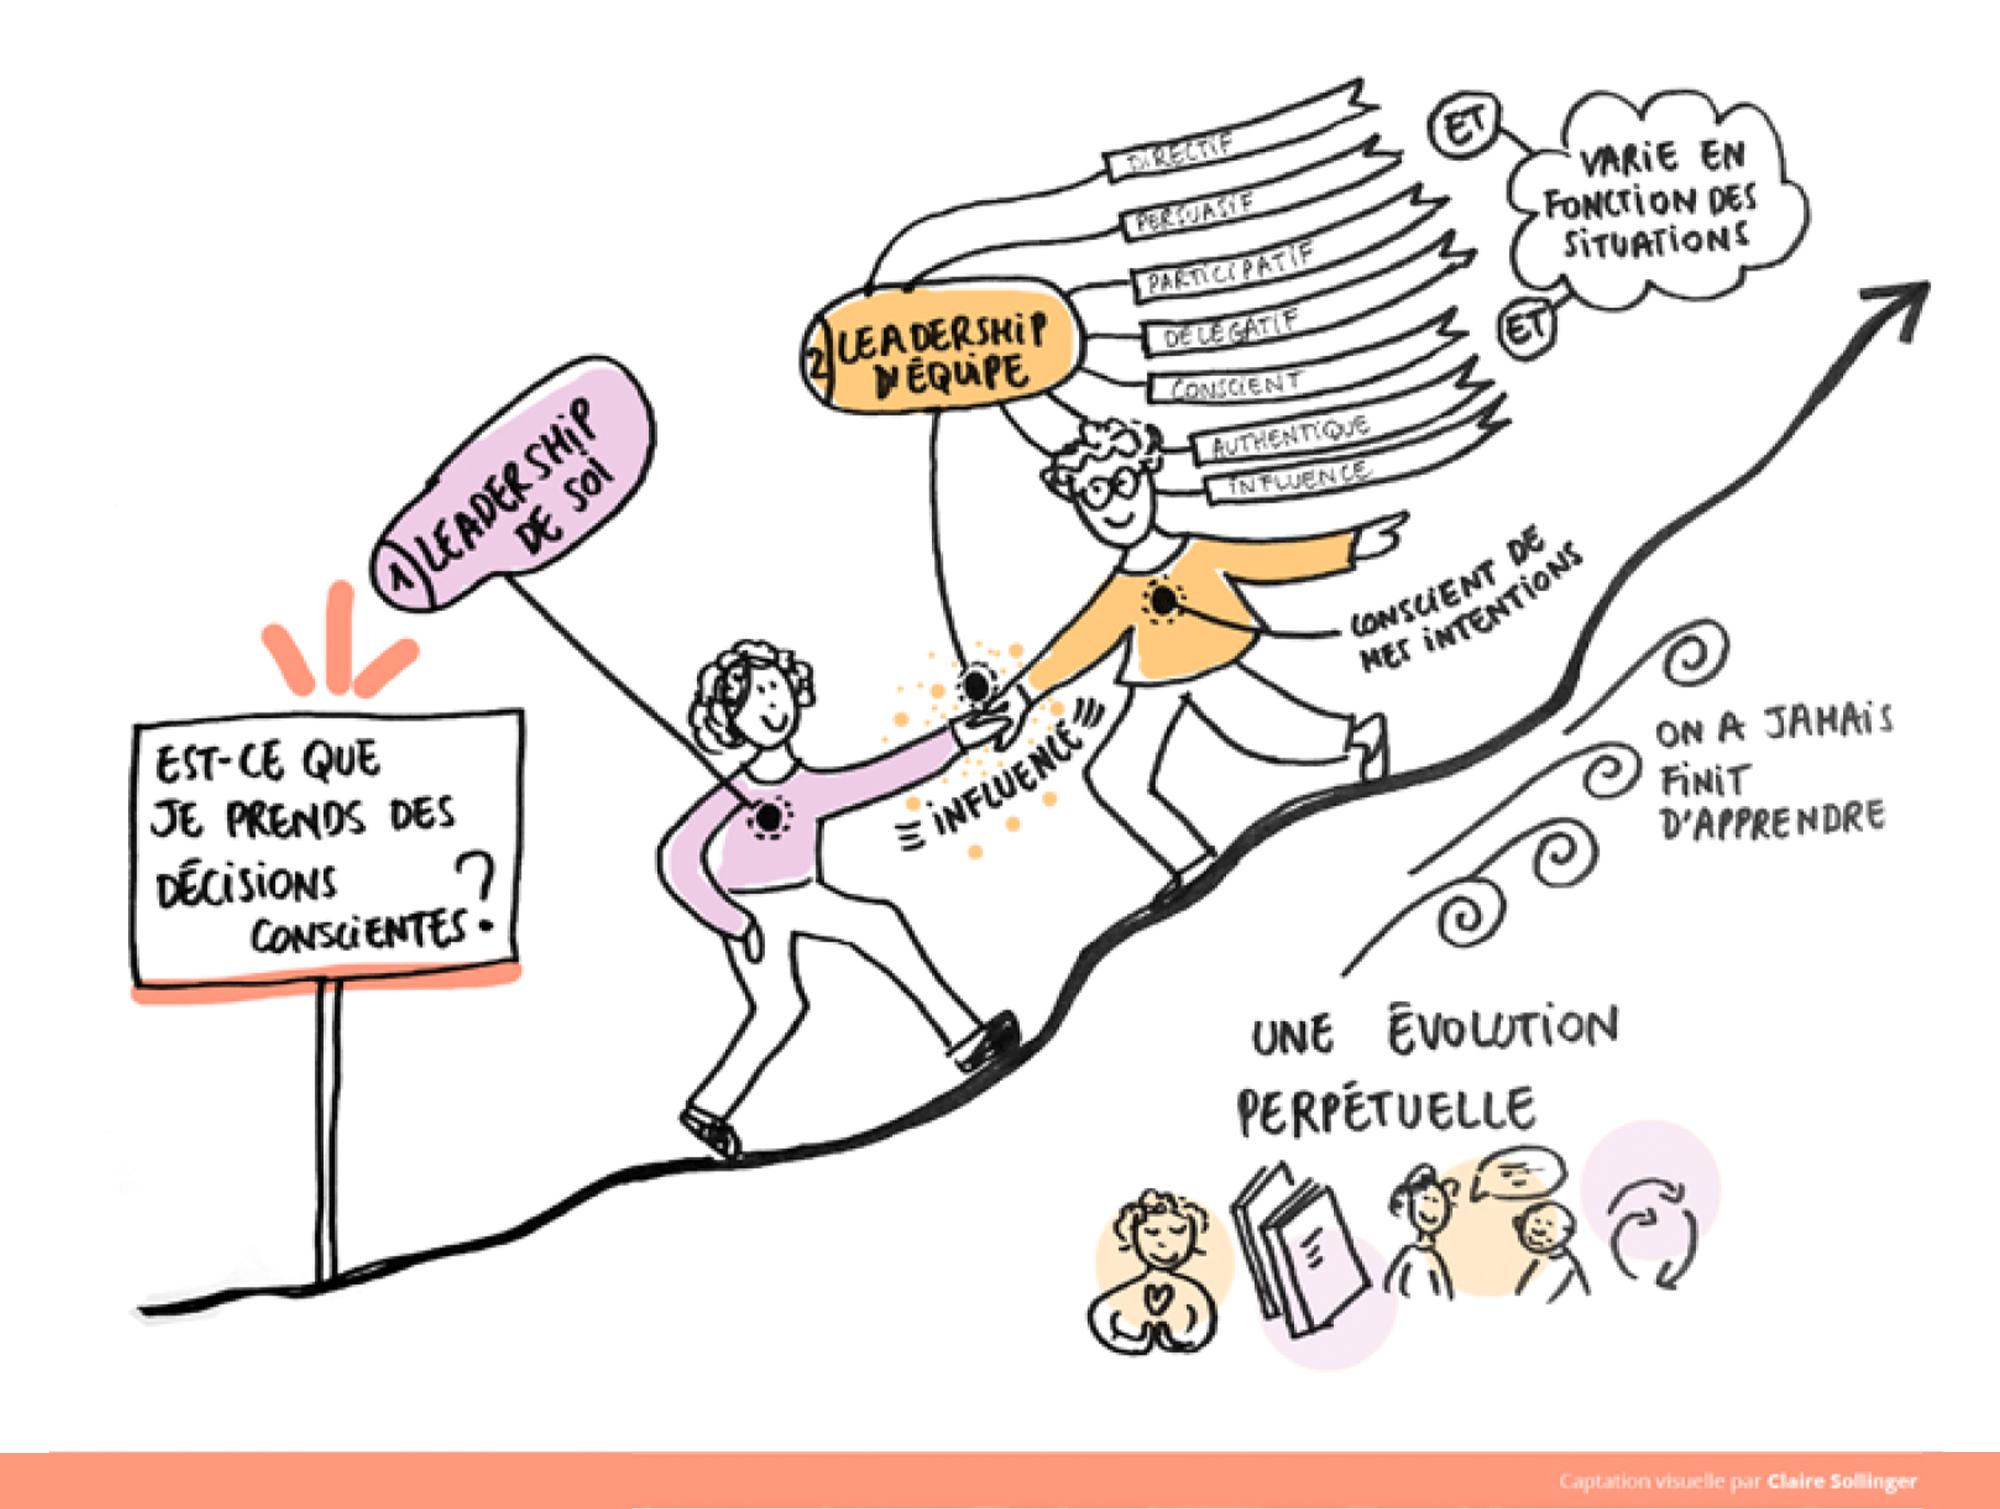 Sketchnoting leadership